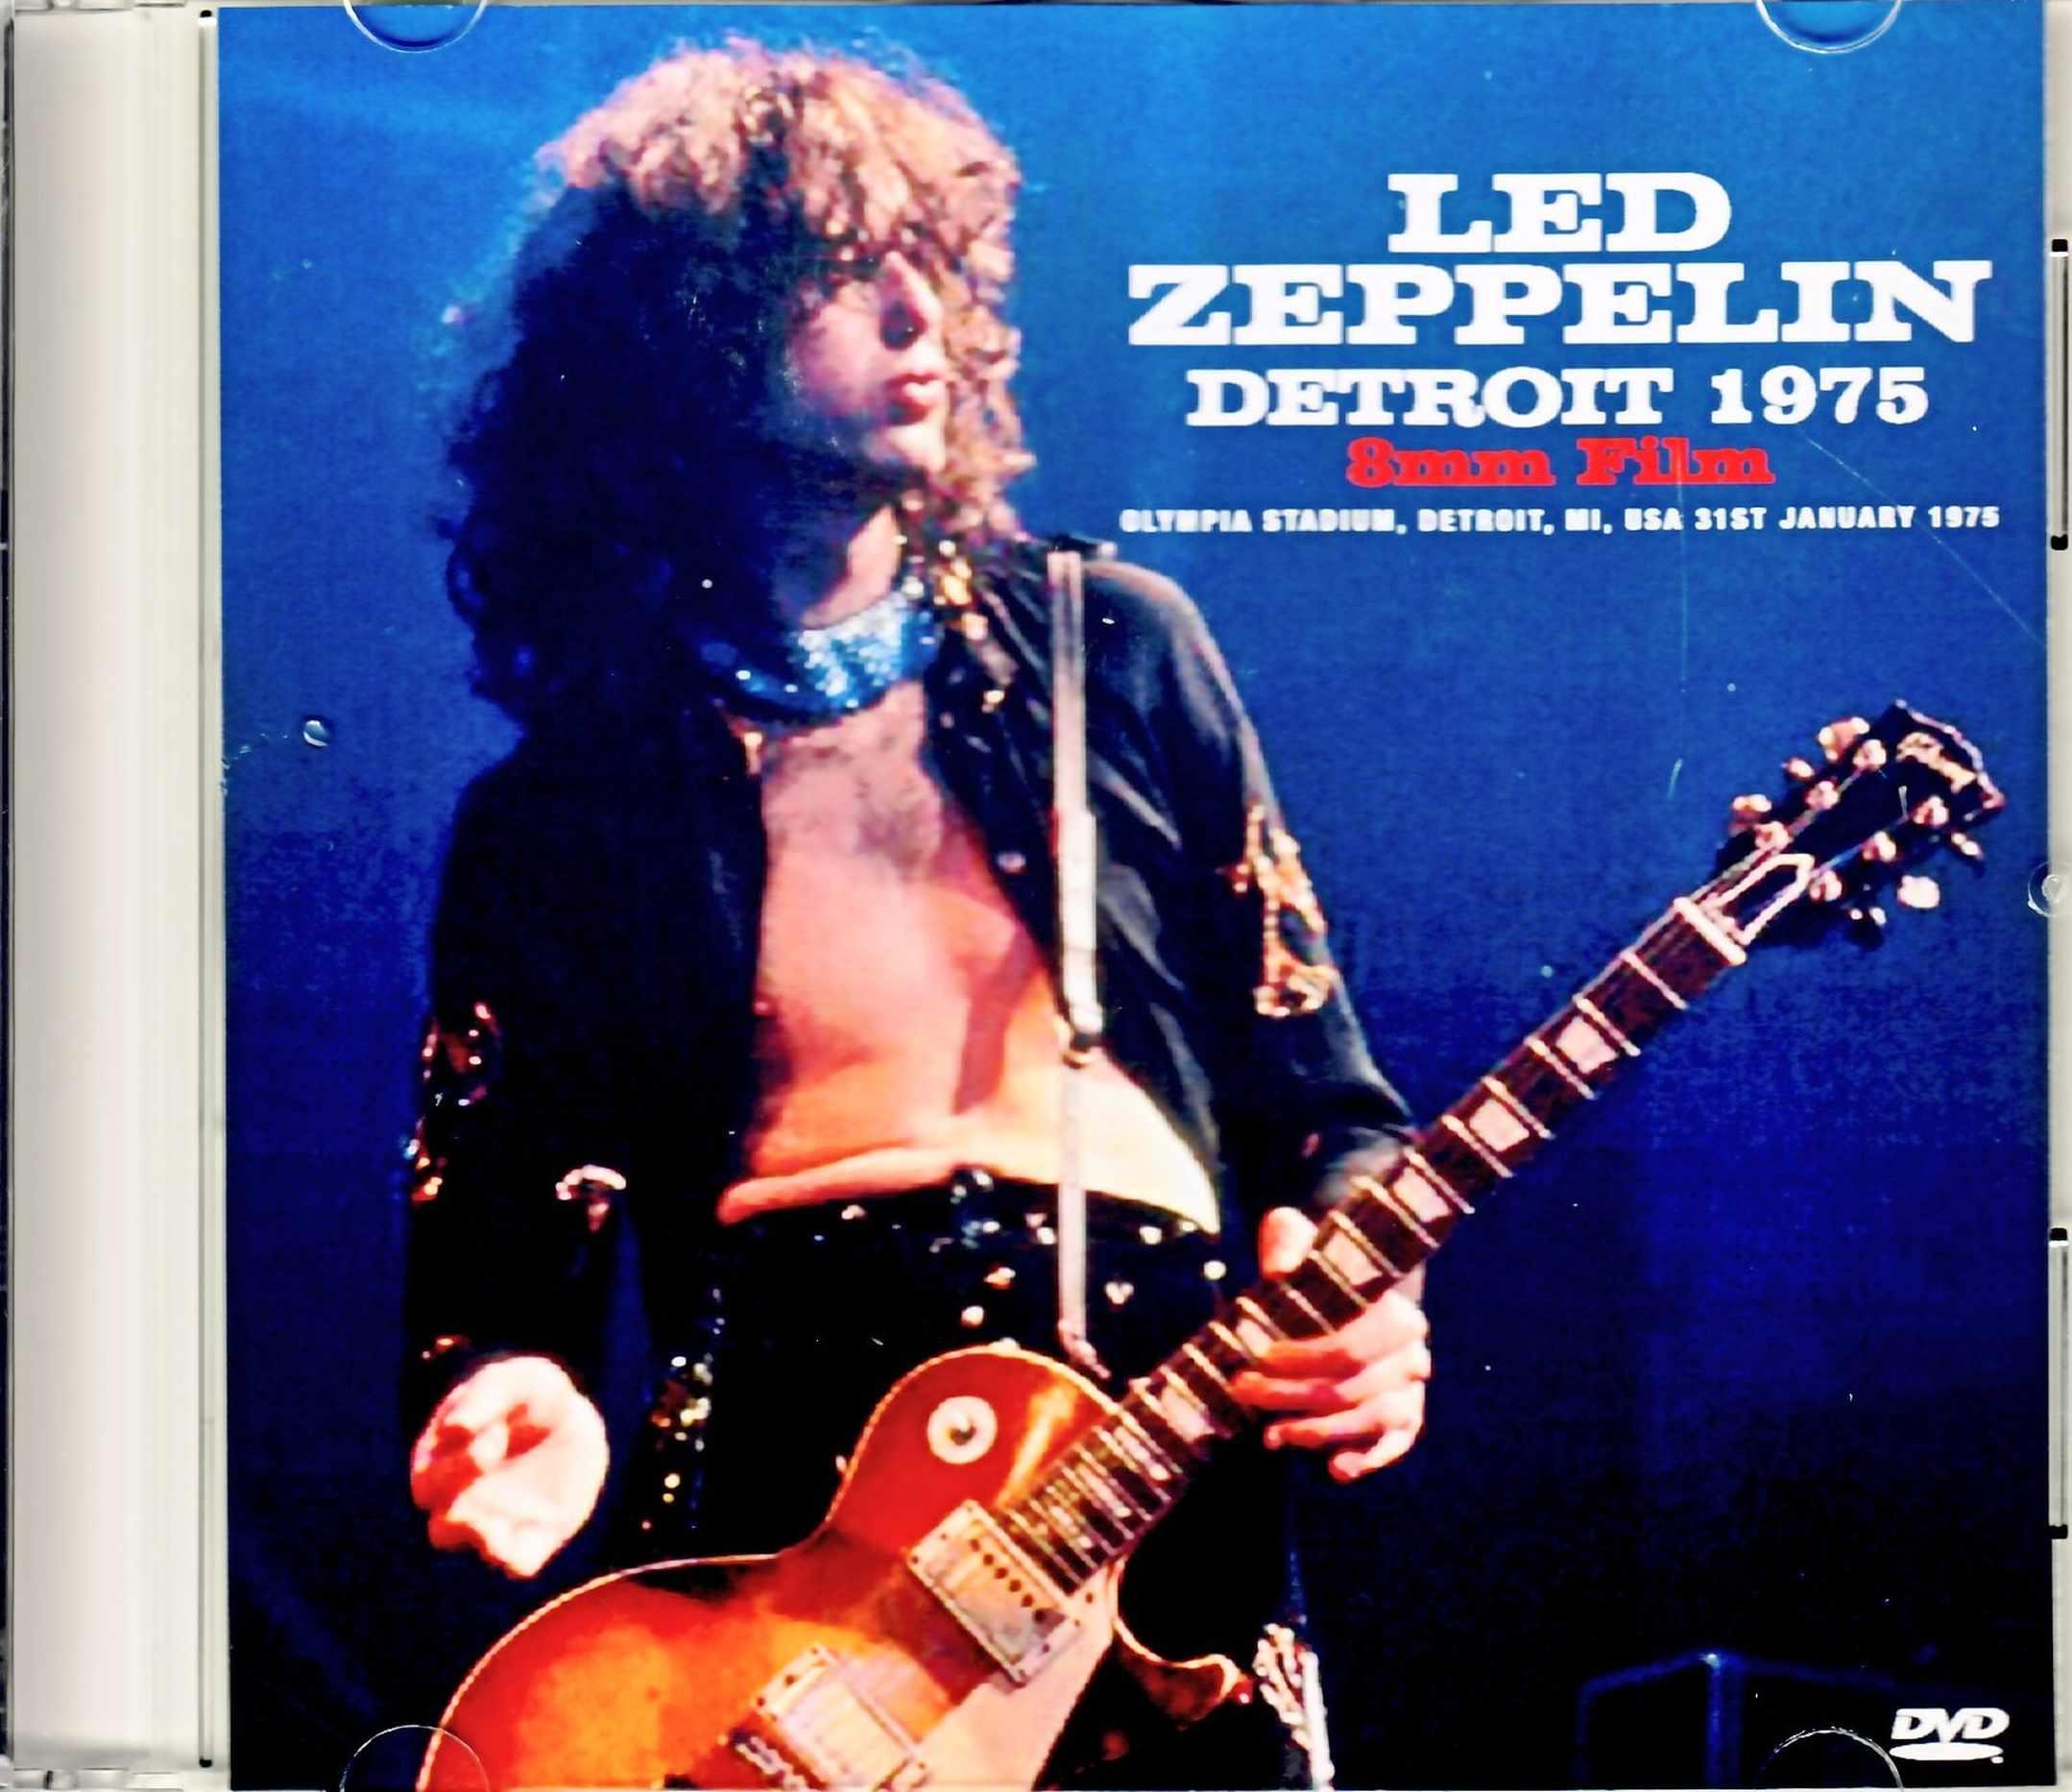 Led Zeppelin レッド・ツェッペリン/MI,USA 1975 8mm Film